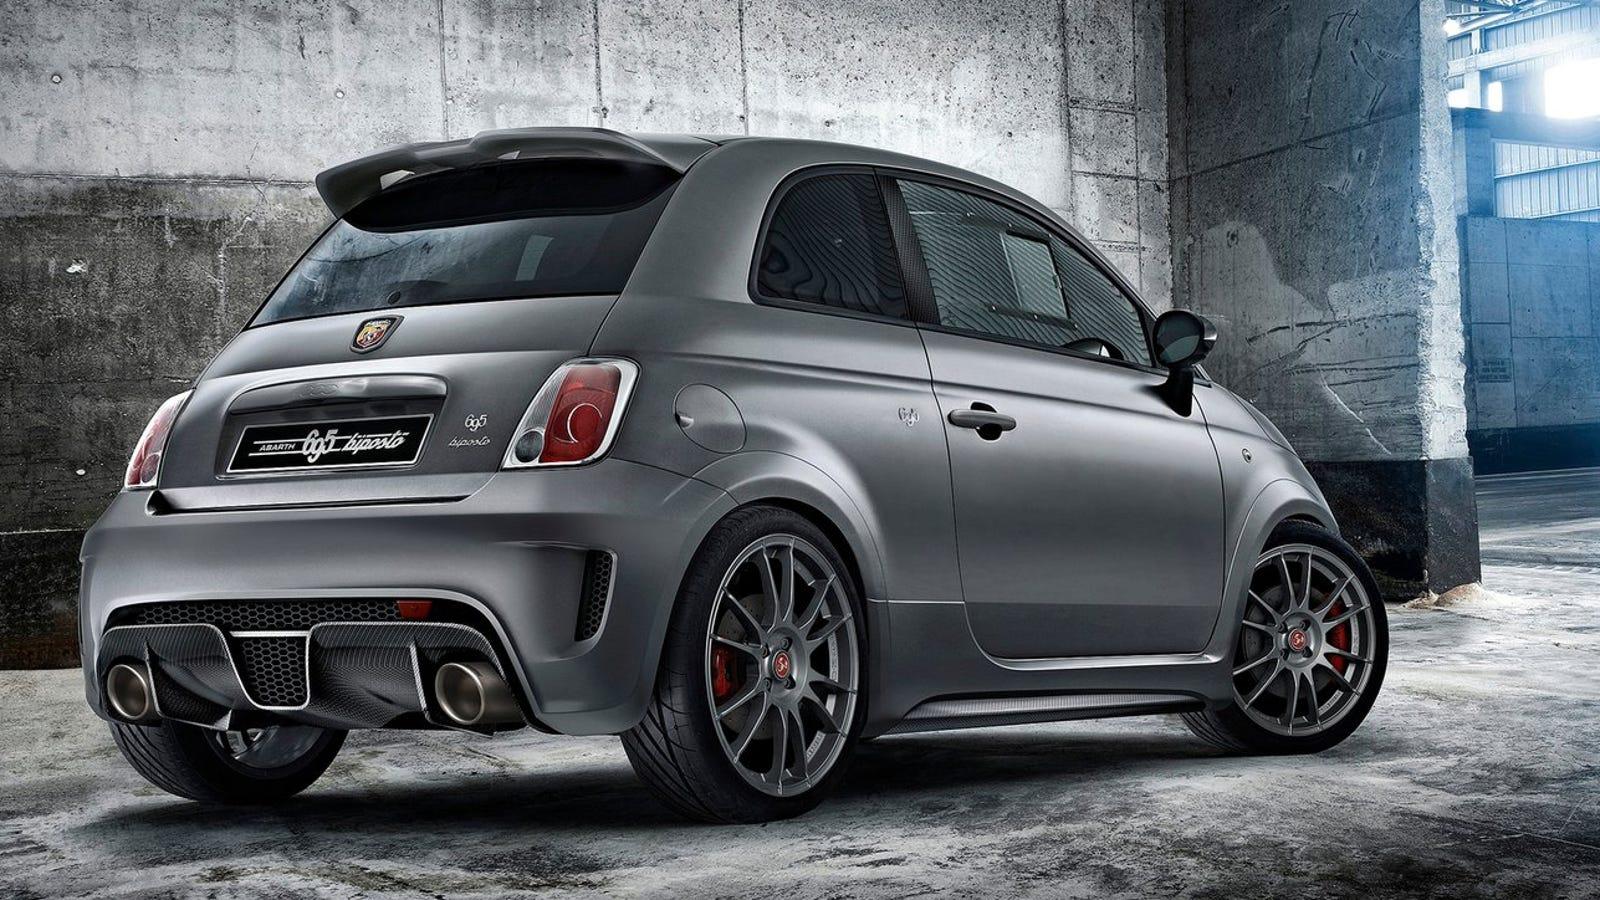 Fiat 500 abarth News Videos Reviews and Gossip  Jalopnik